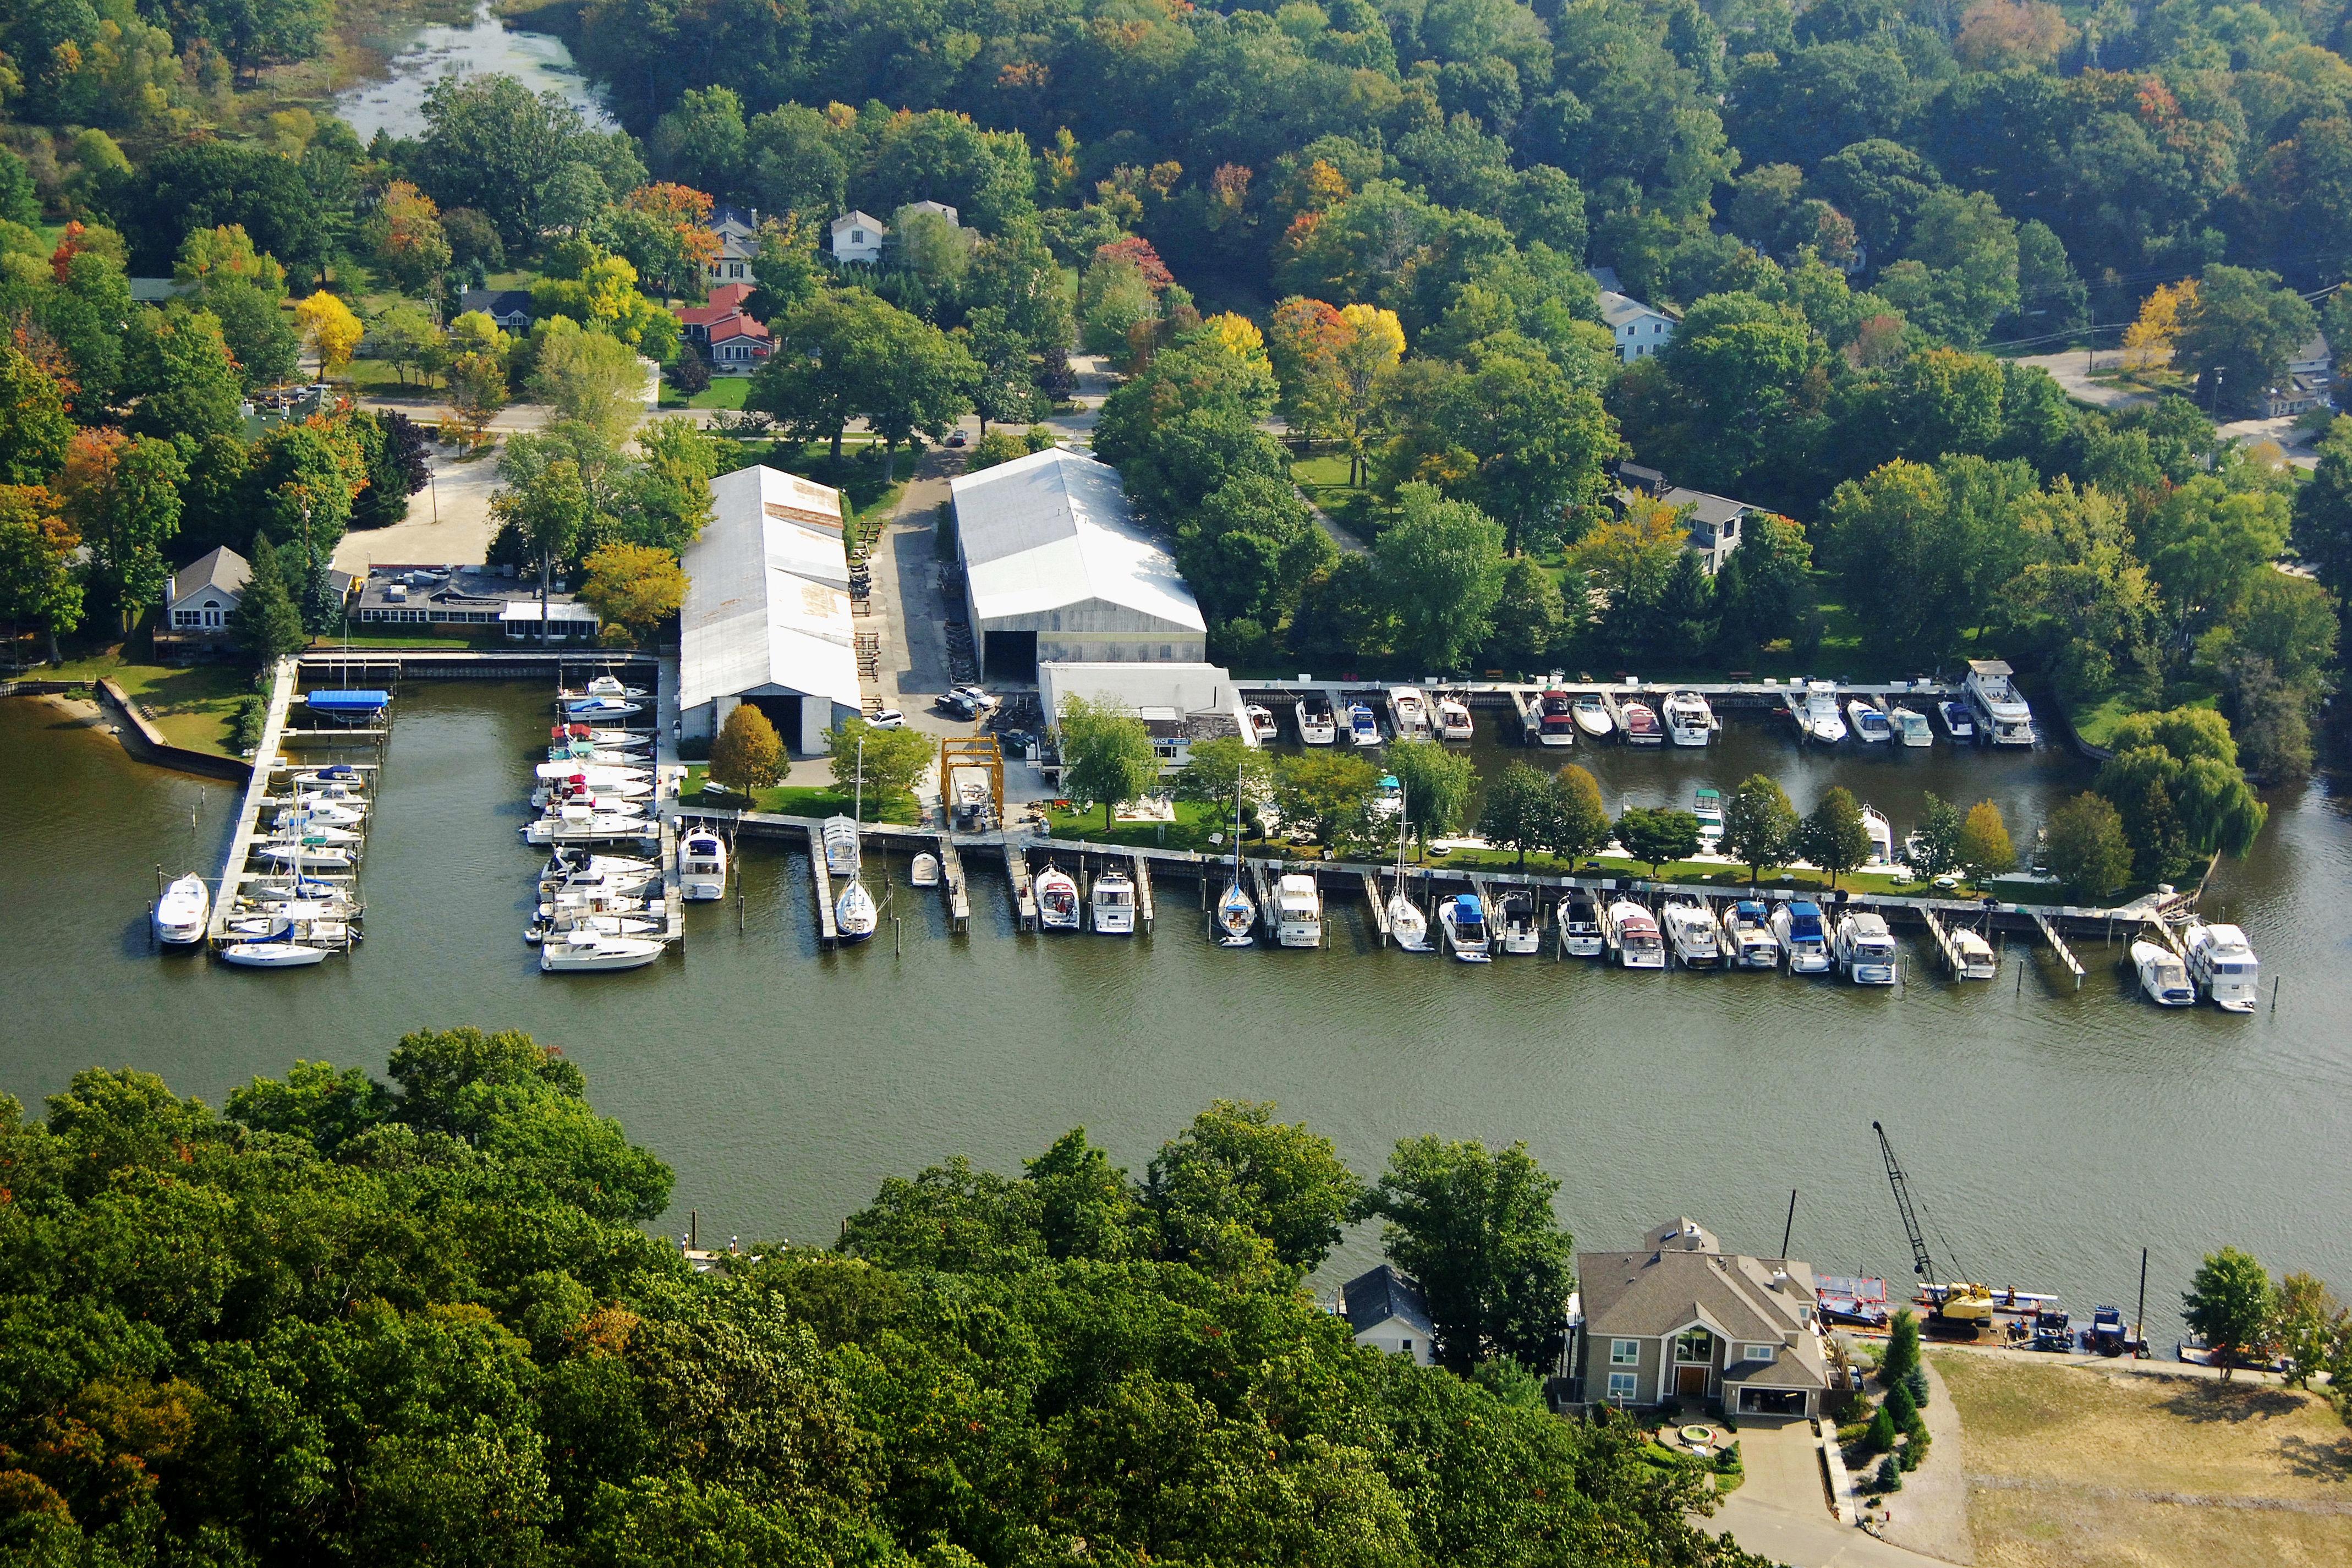 Saugatuck Harbor Yacht Club in Westport, CT, United States